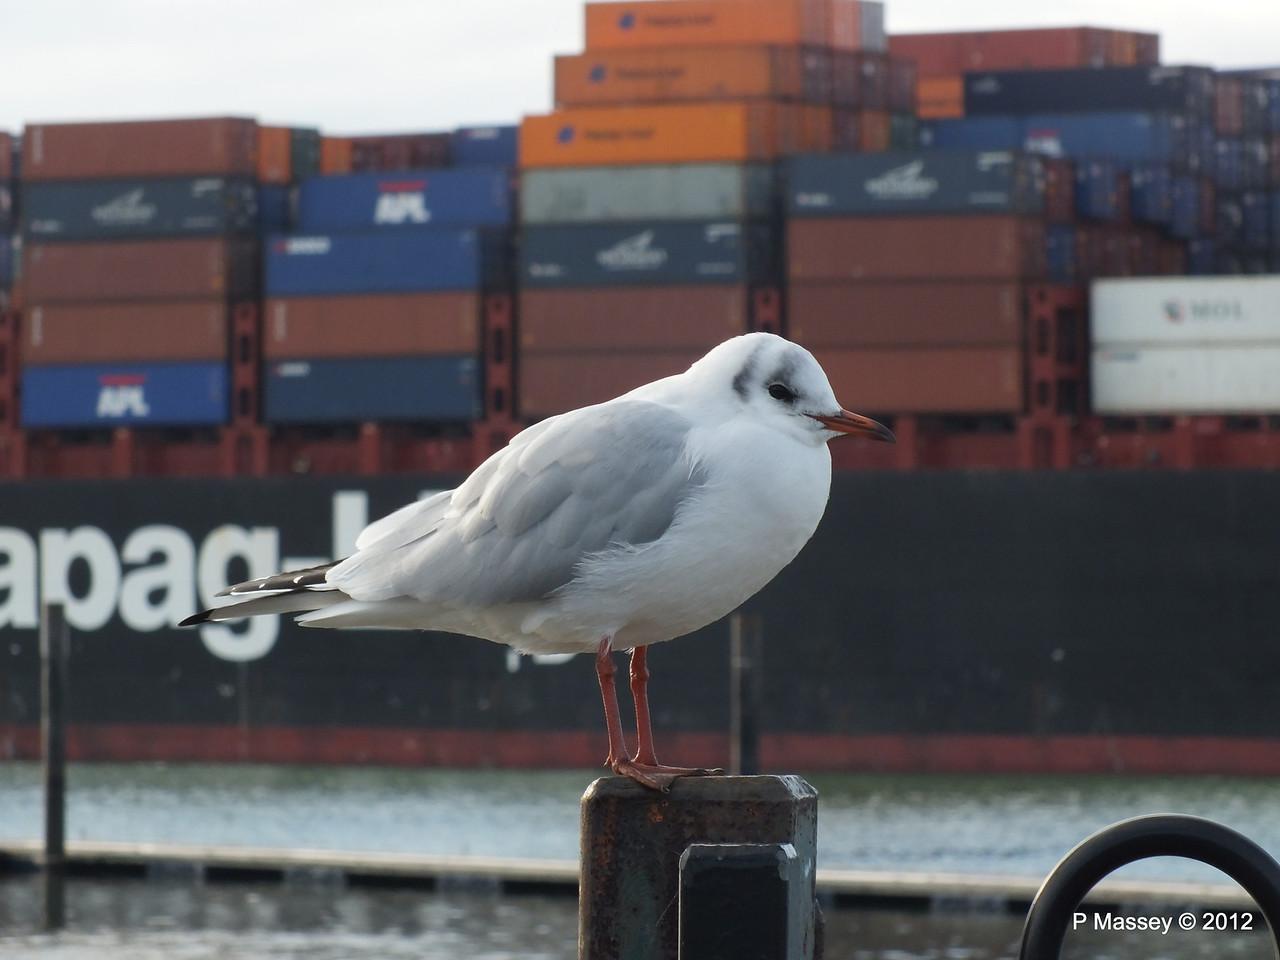 Seagull KYOTO EXPRESS 08-11-2012 10-59-02